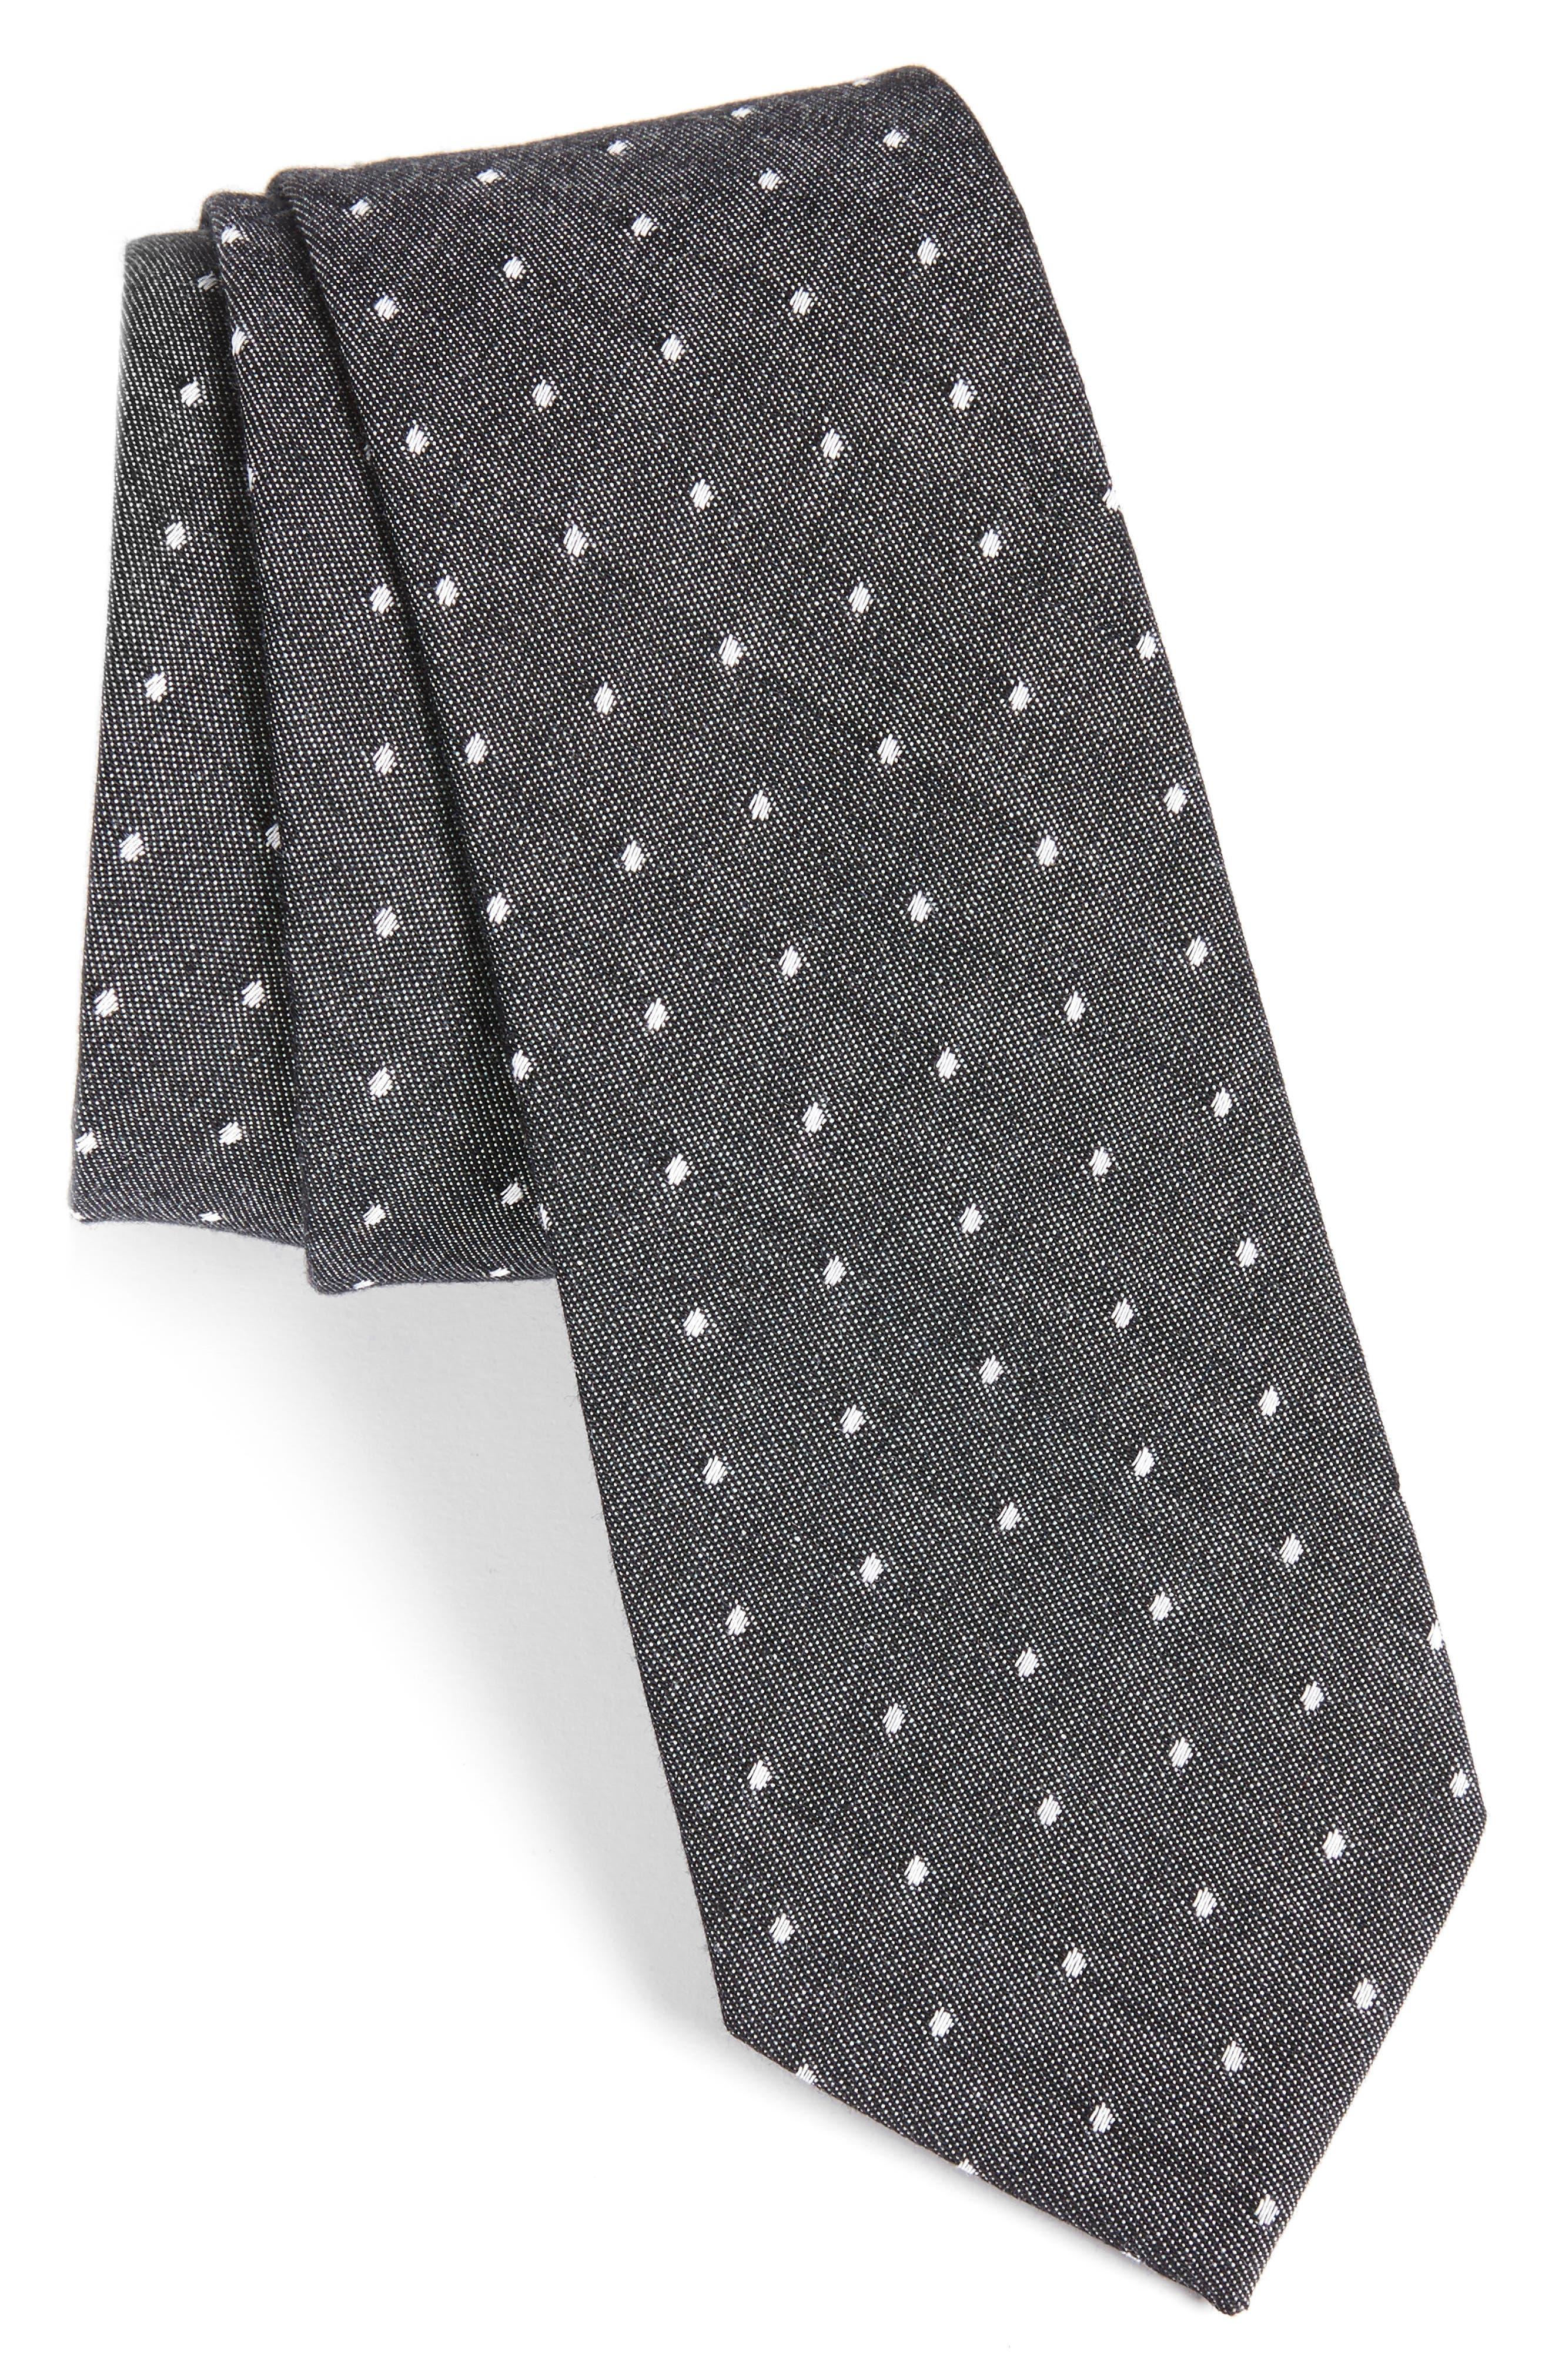 Main Image - 1901 Dot Cotton Tie